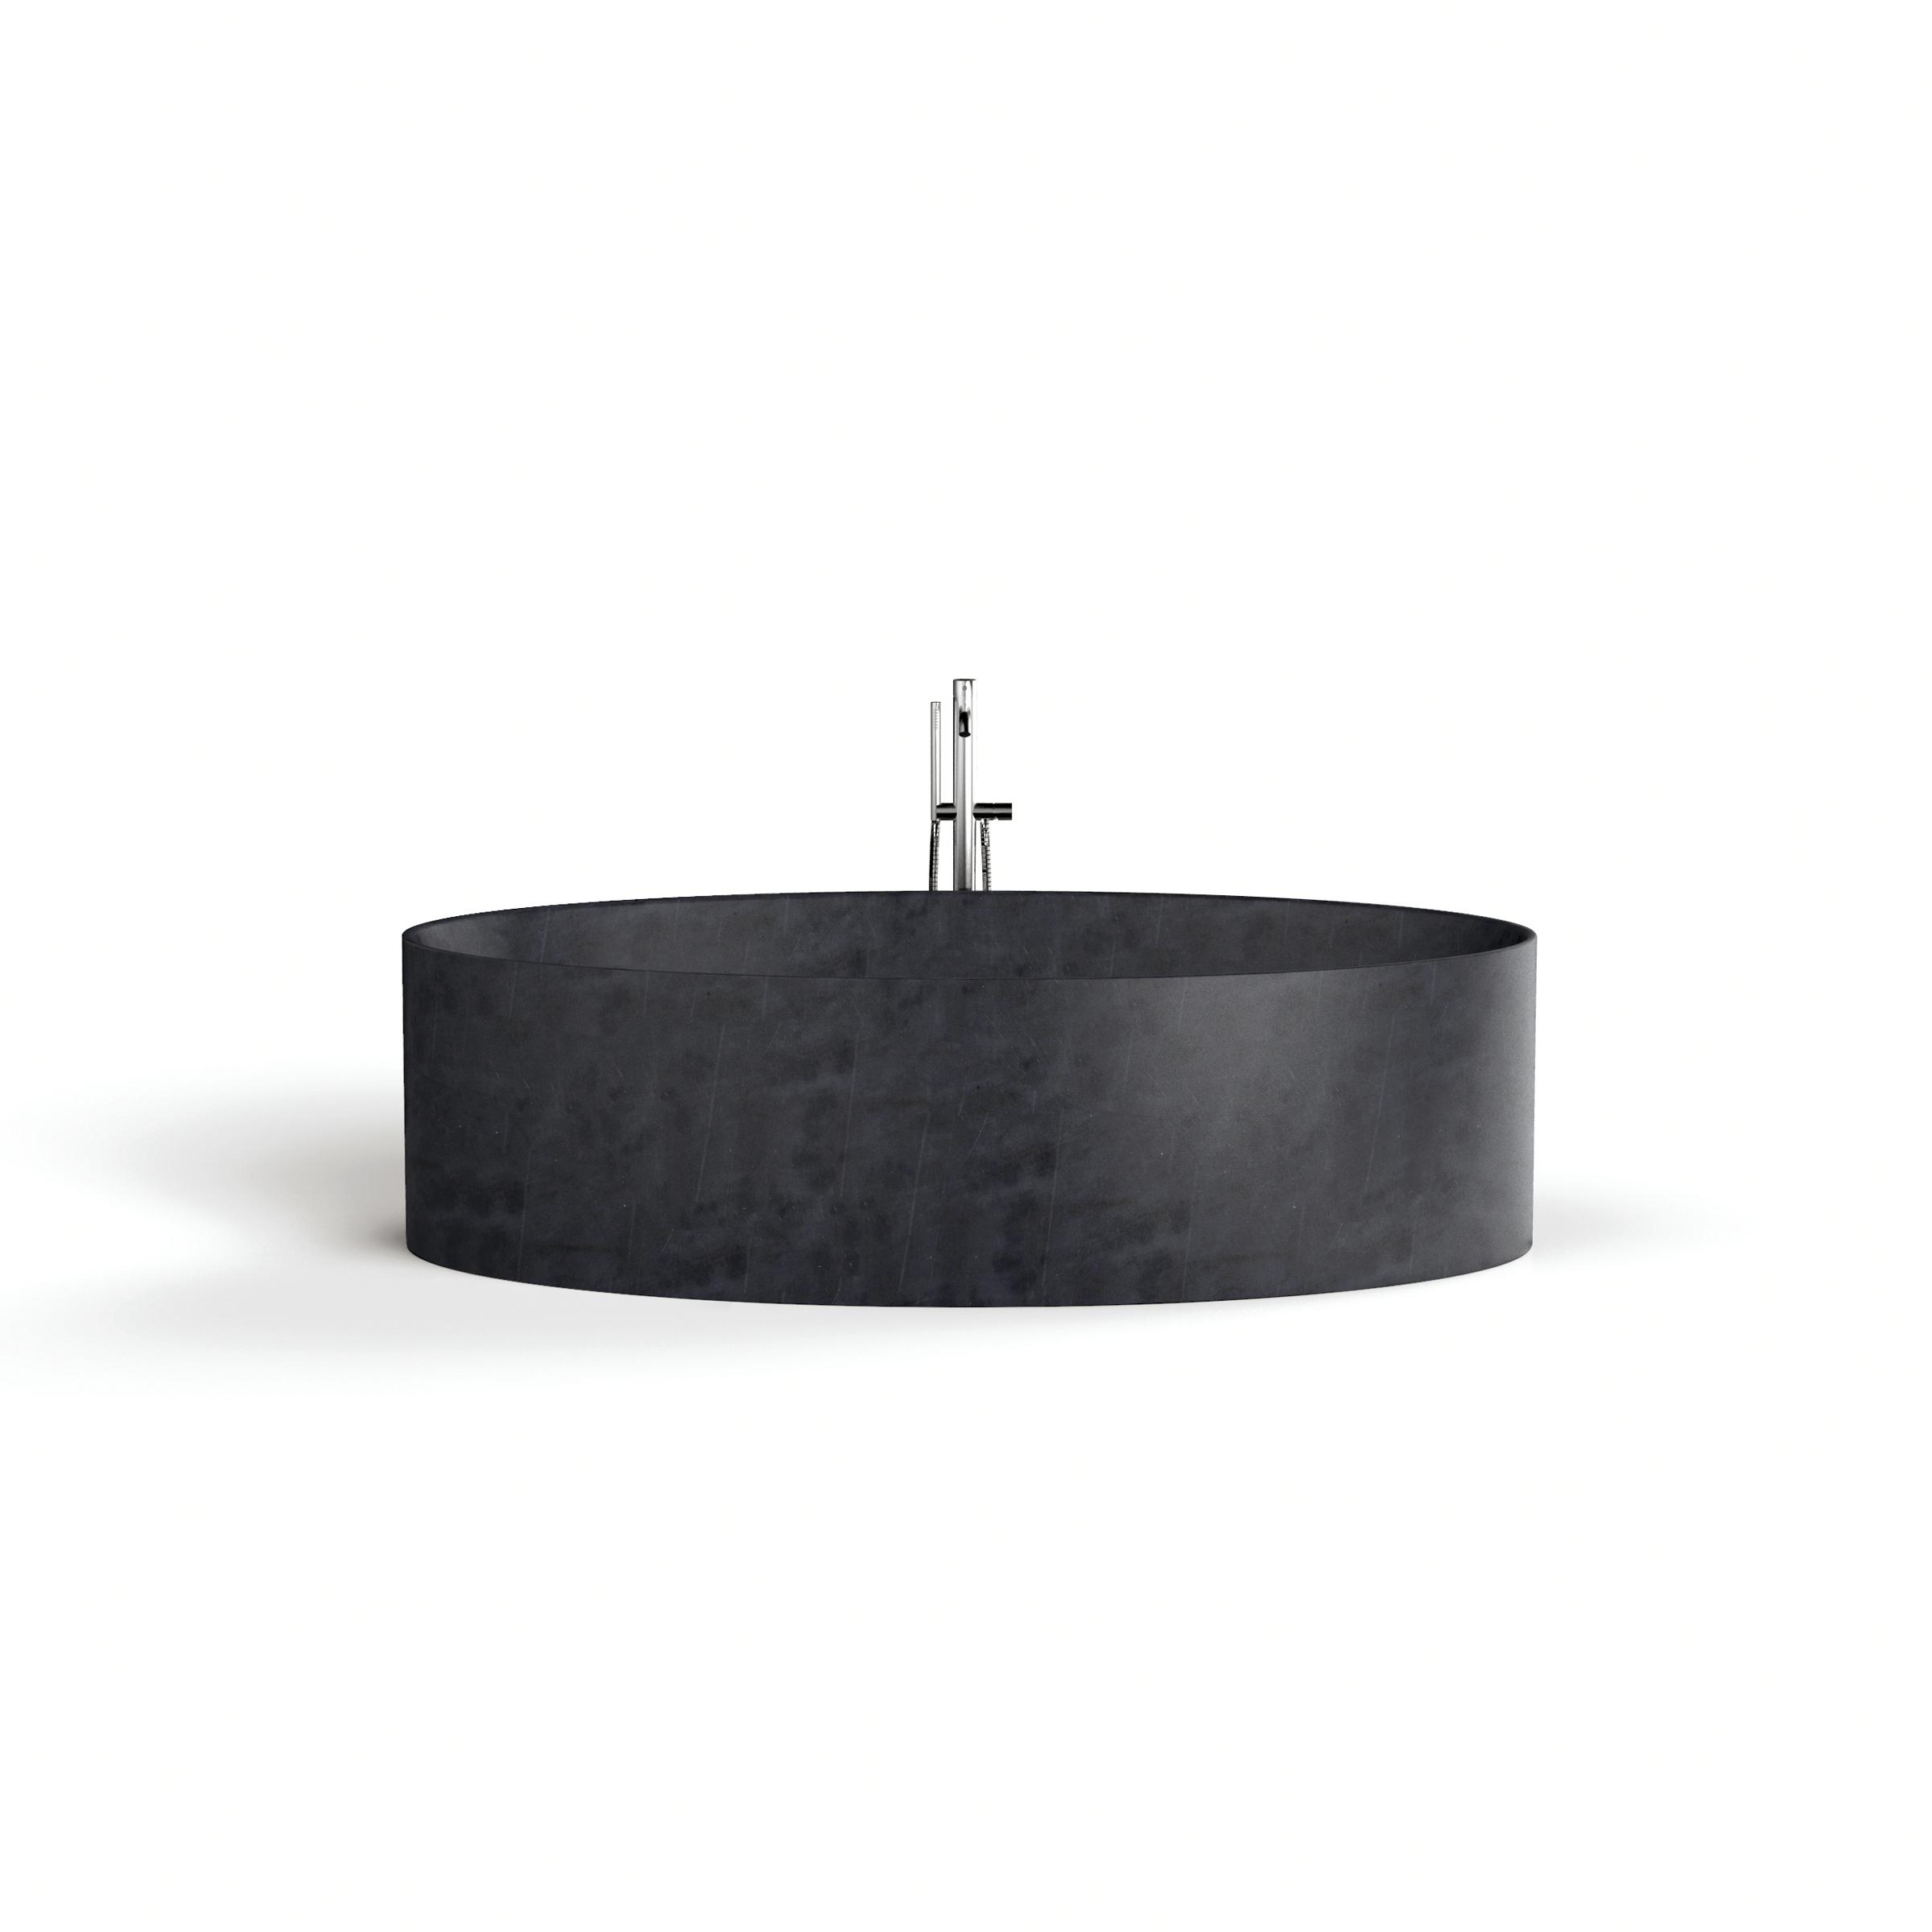 OVALE BATH | Marmi Serafini